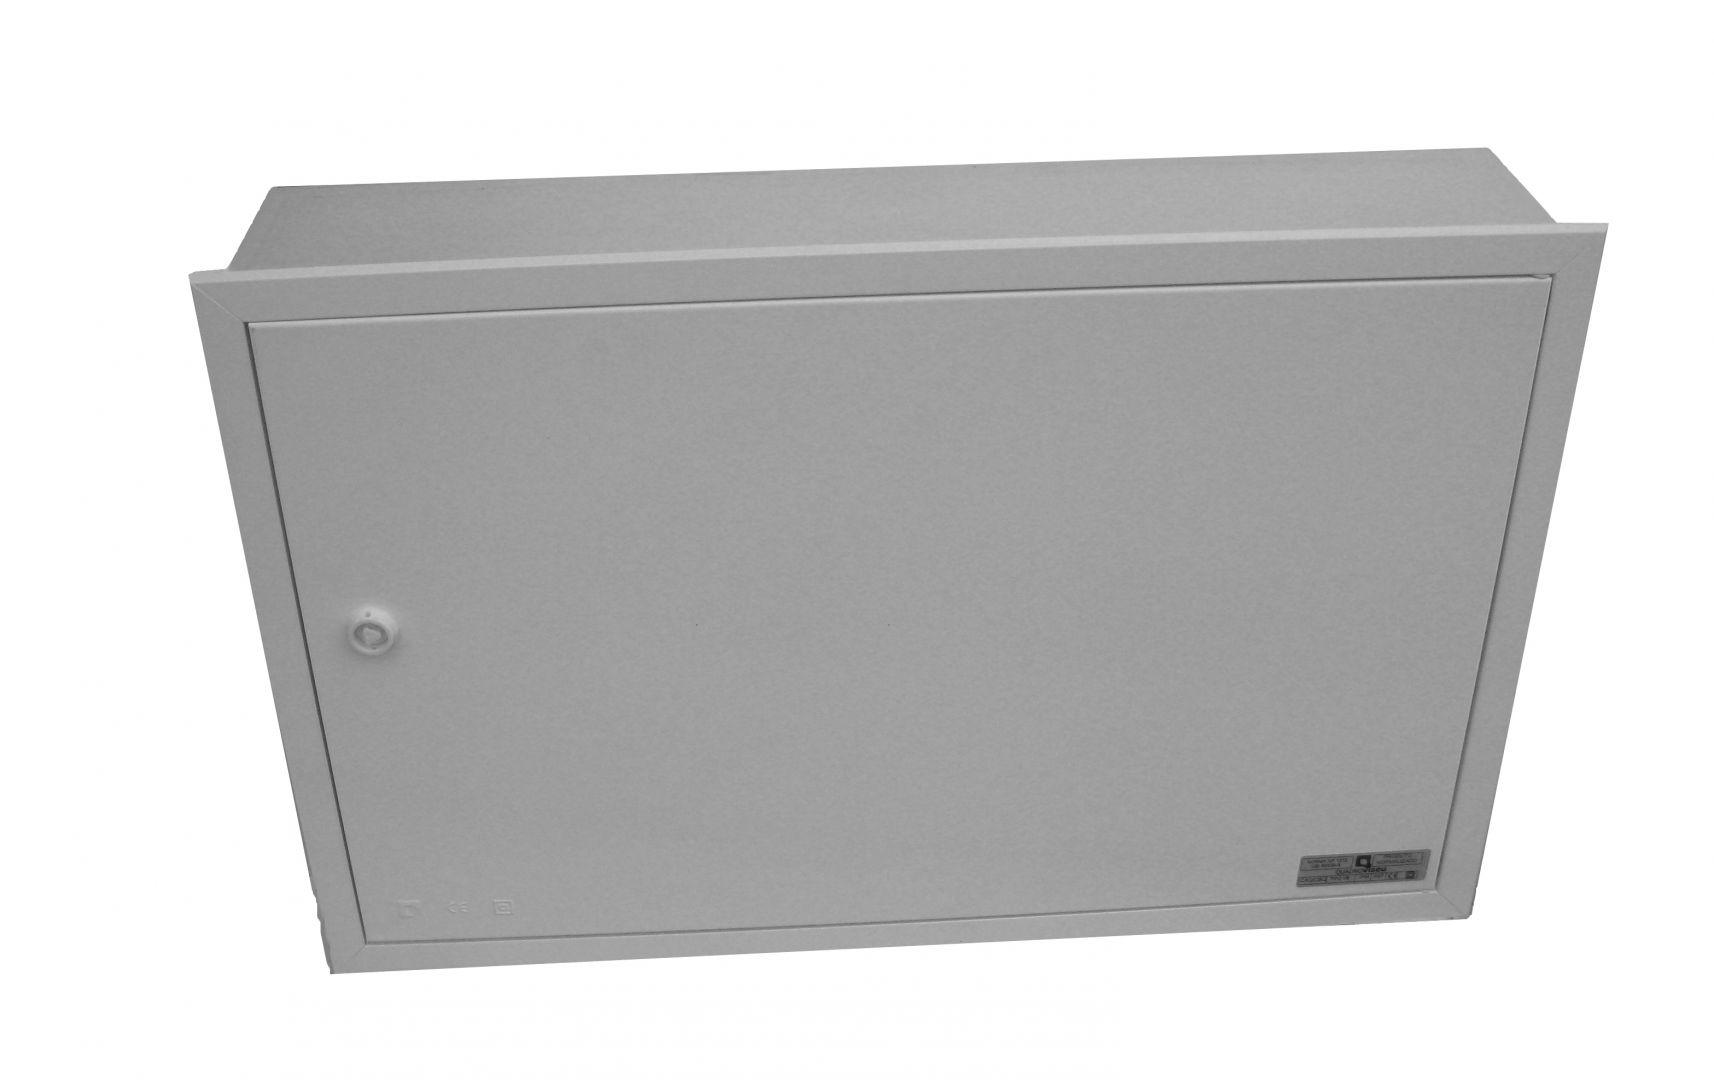 ENVELOPE VISBOX VIDE A ENCASTRER AVEC PORTE 500X320X130